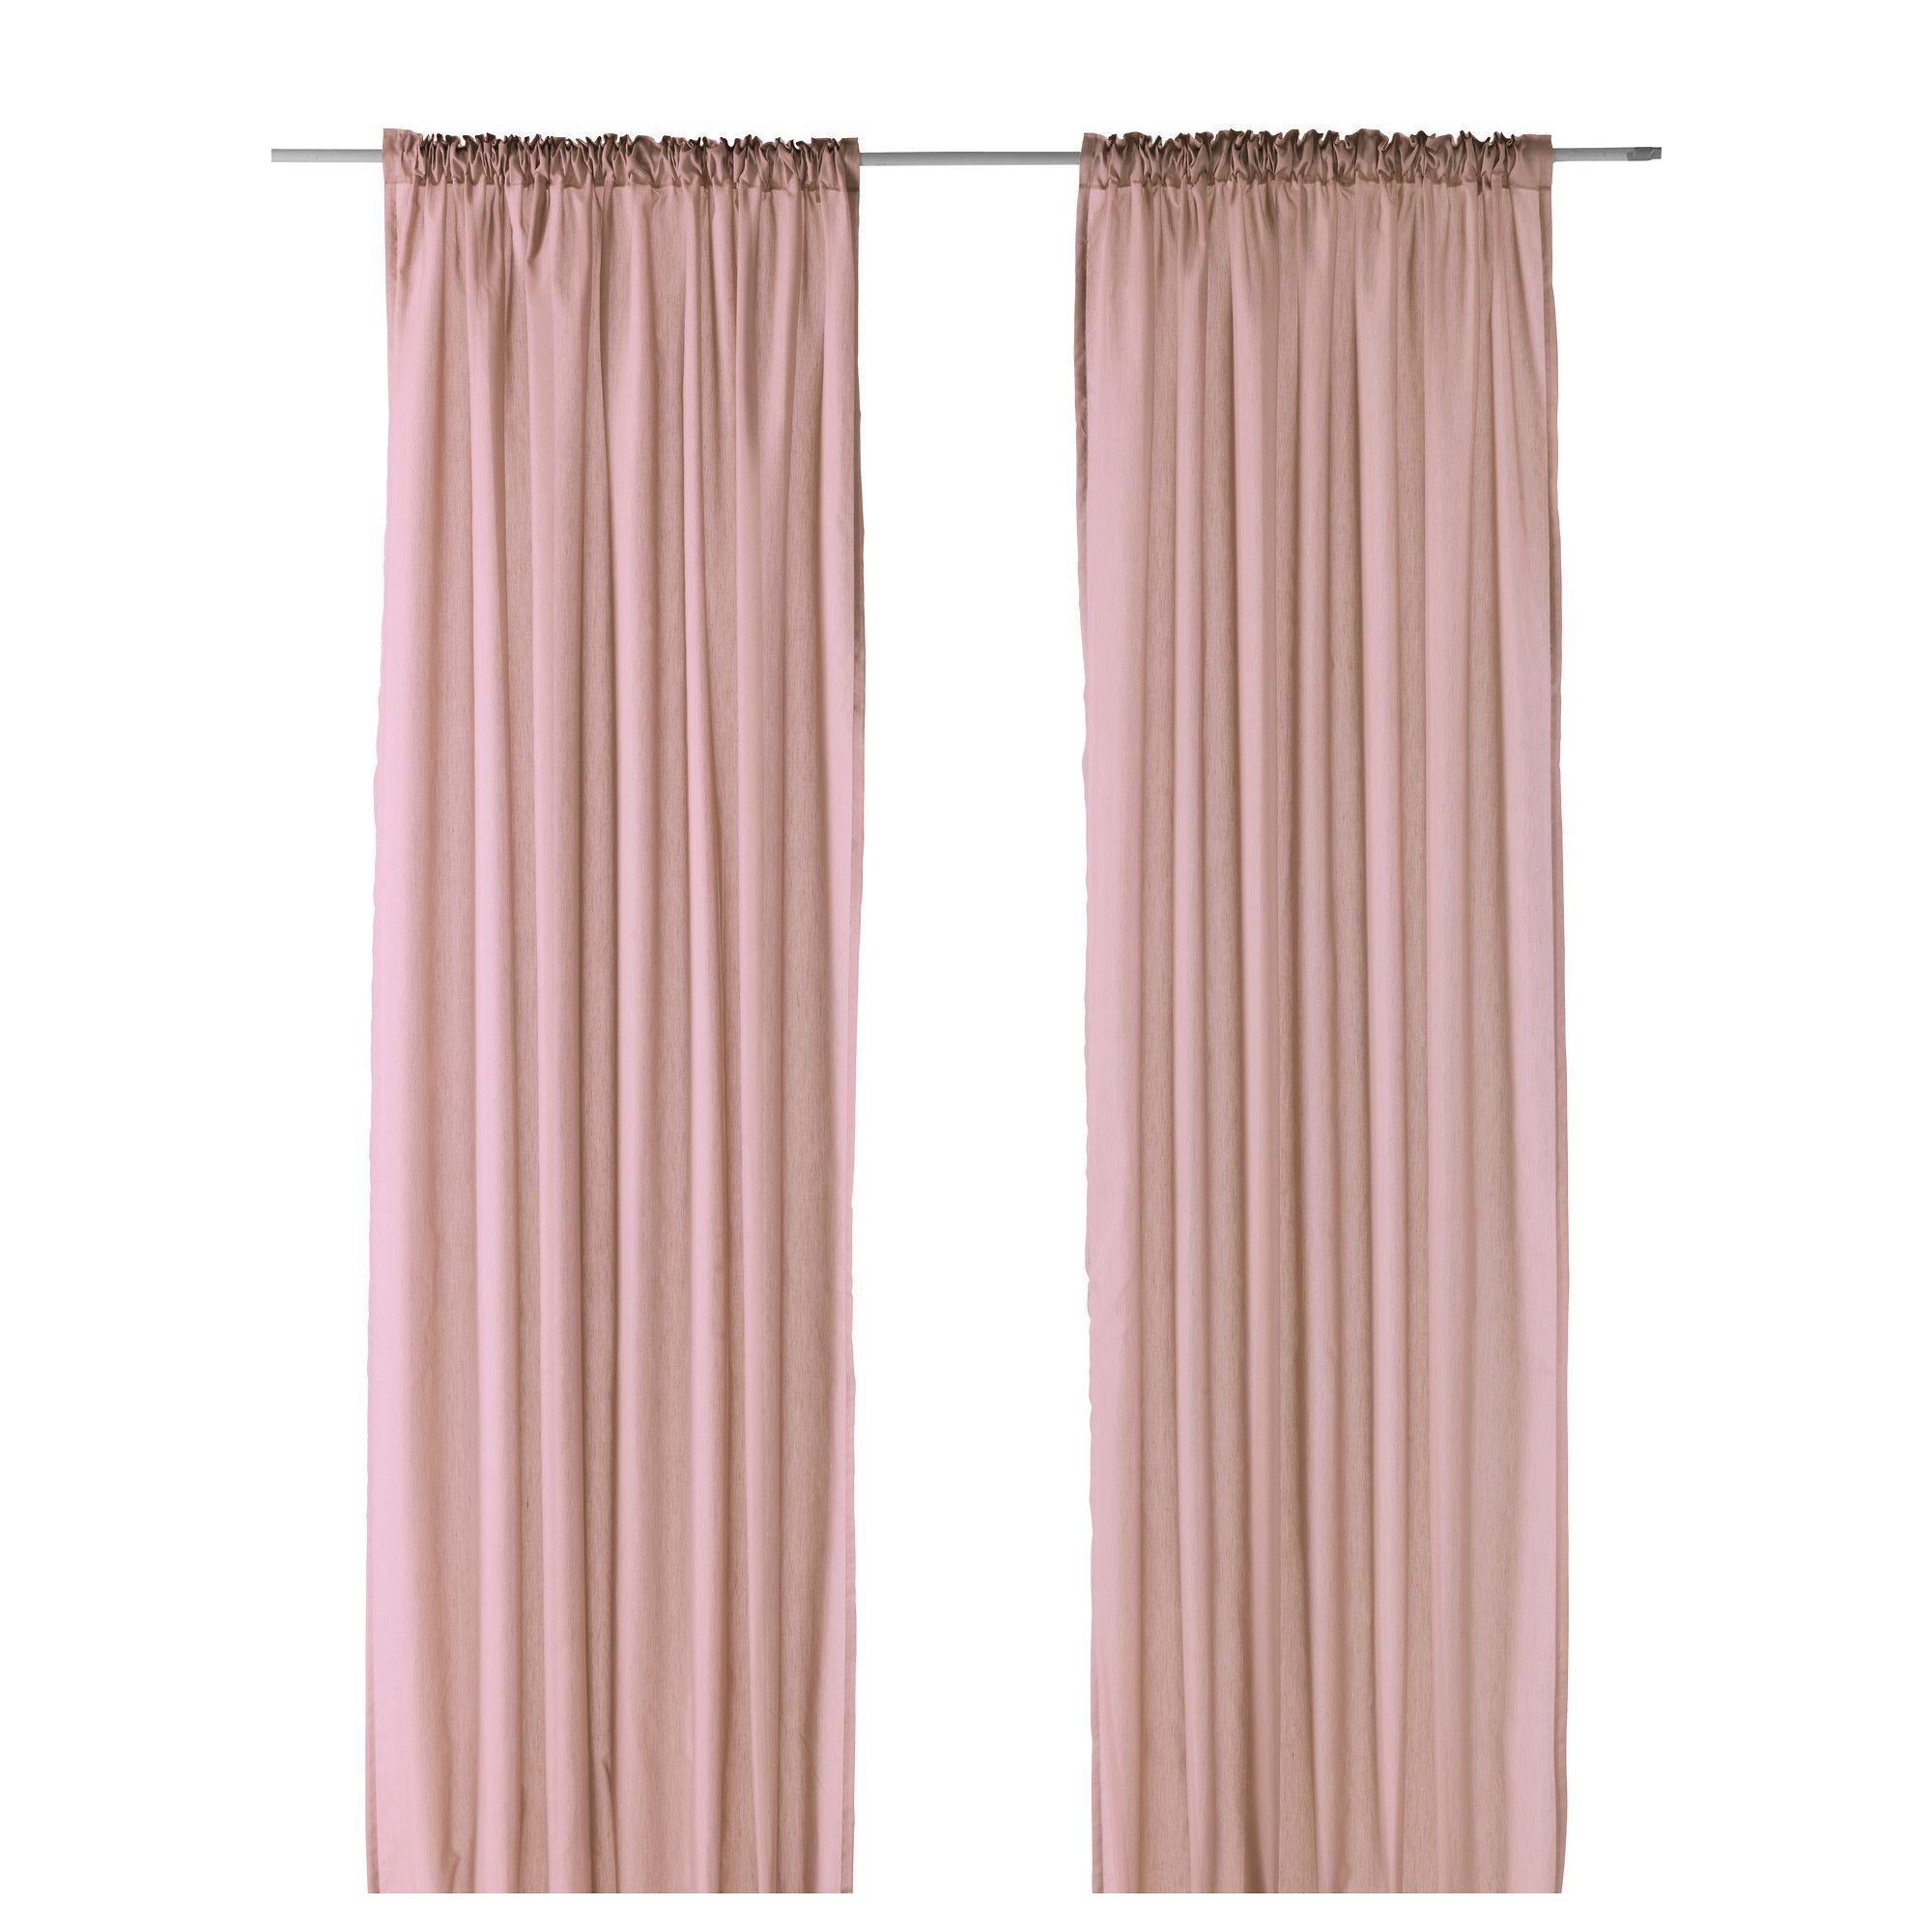 Bedroom Window Curtain